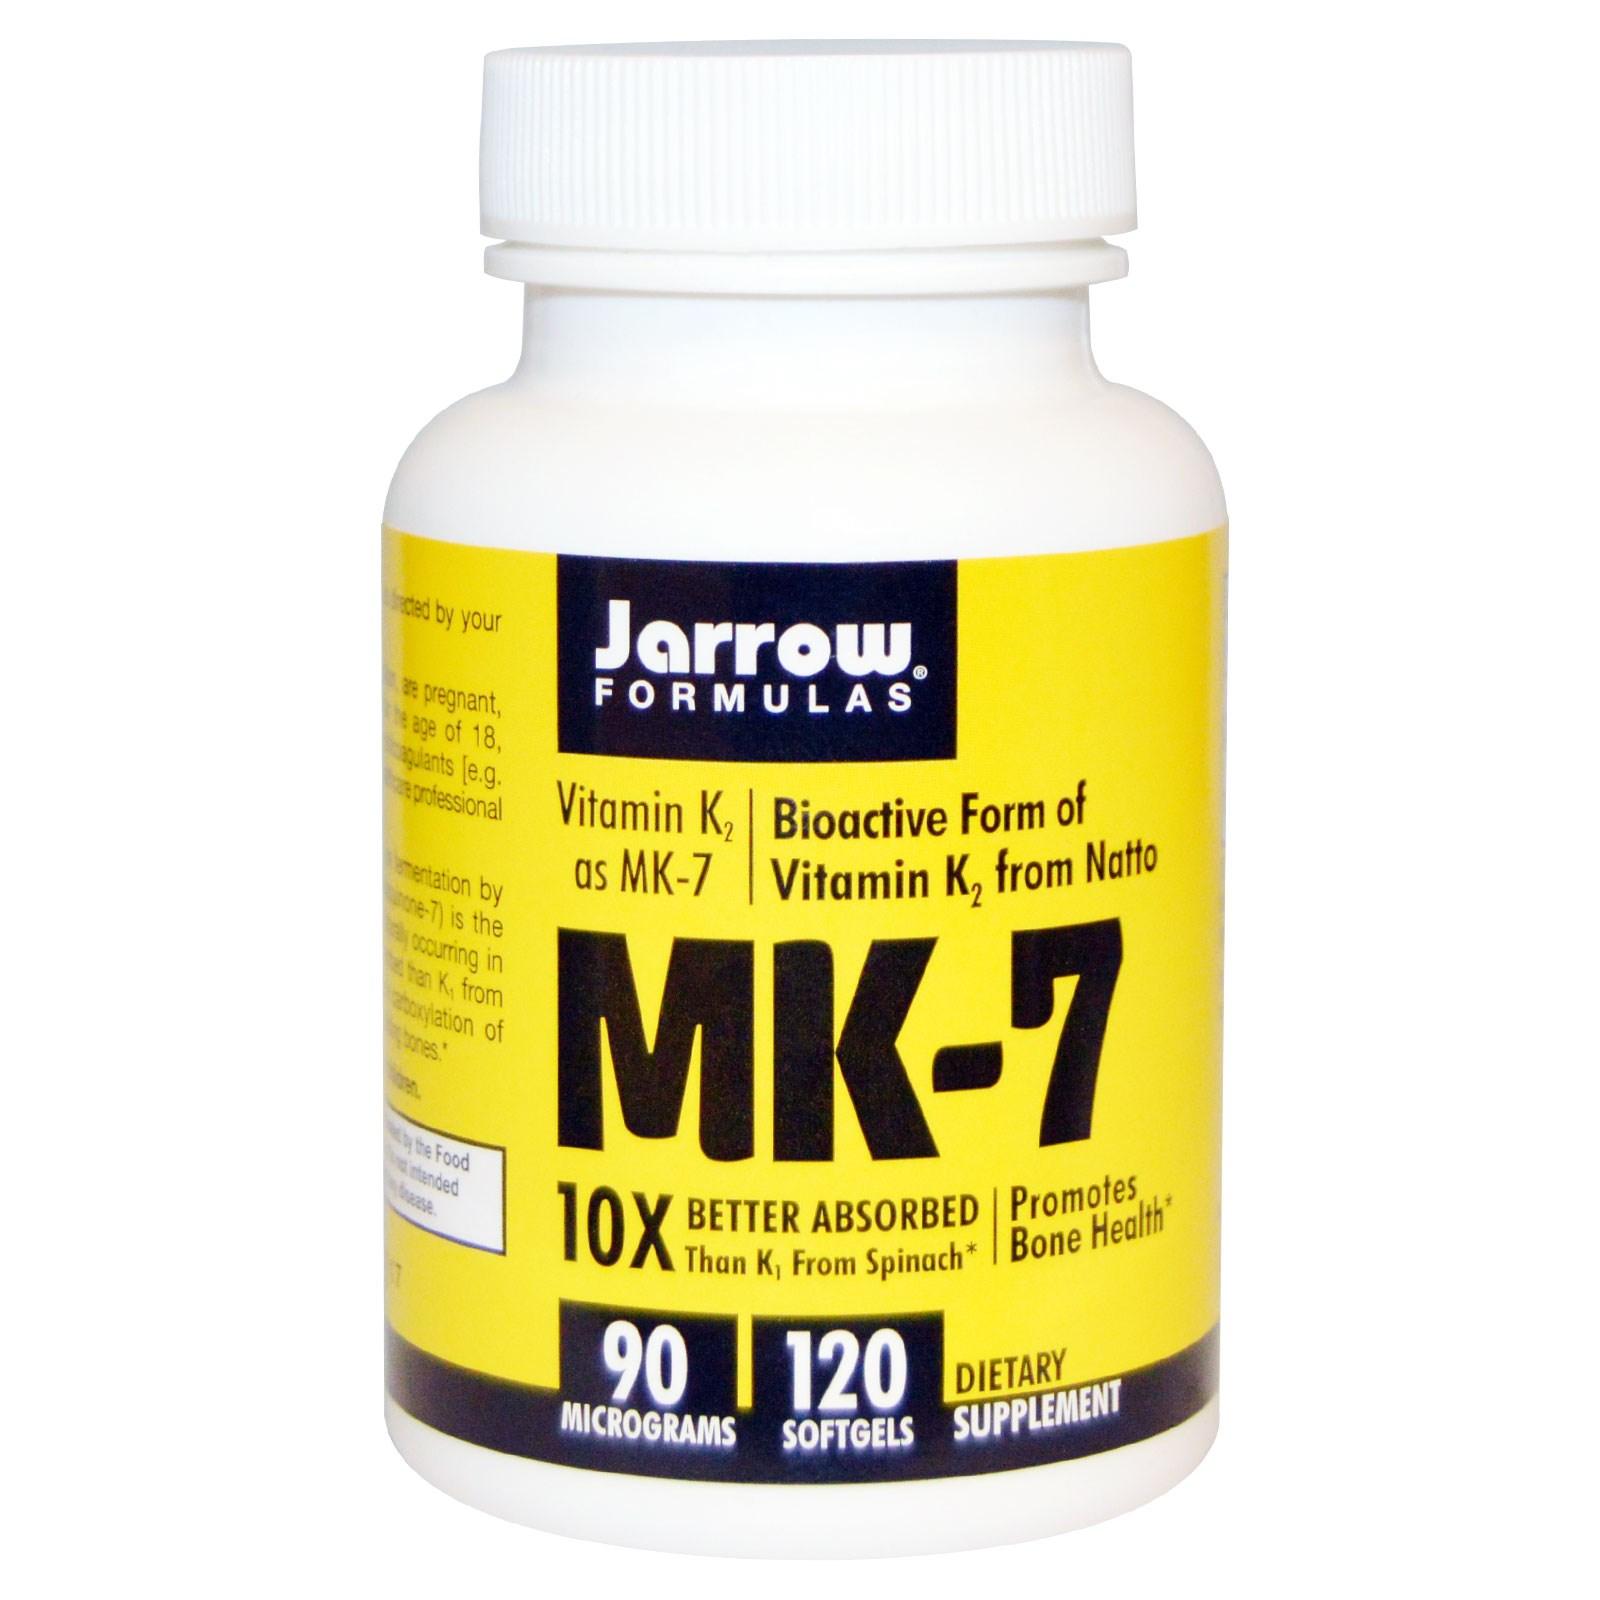 MK-7 vitamine K2 zoals MK-7, 90 mcg (120 gelcapsules) - Jarrow Formulas